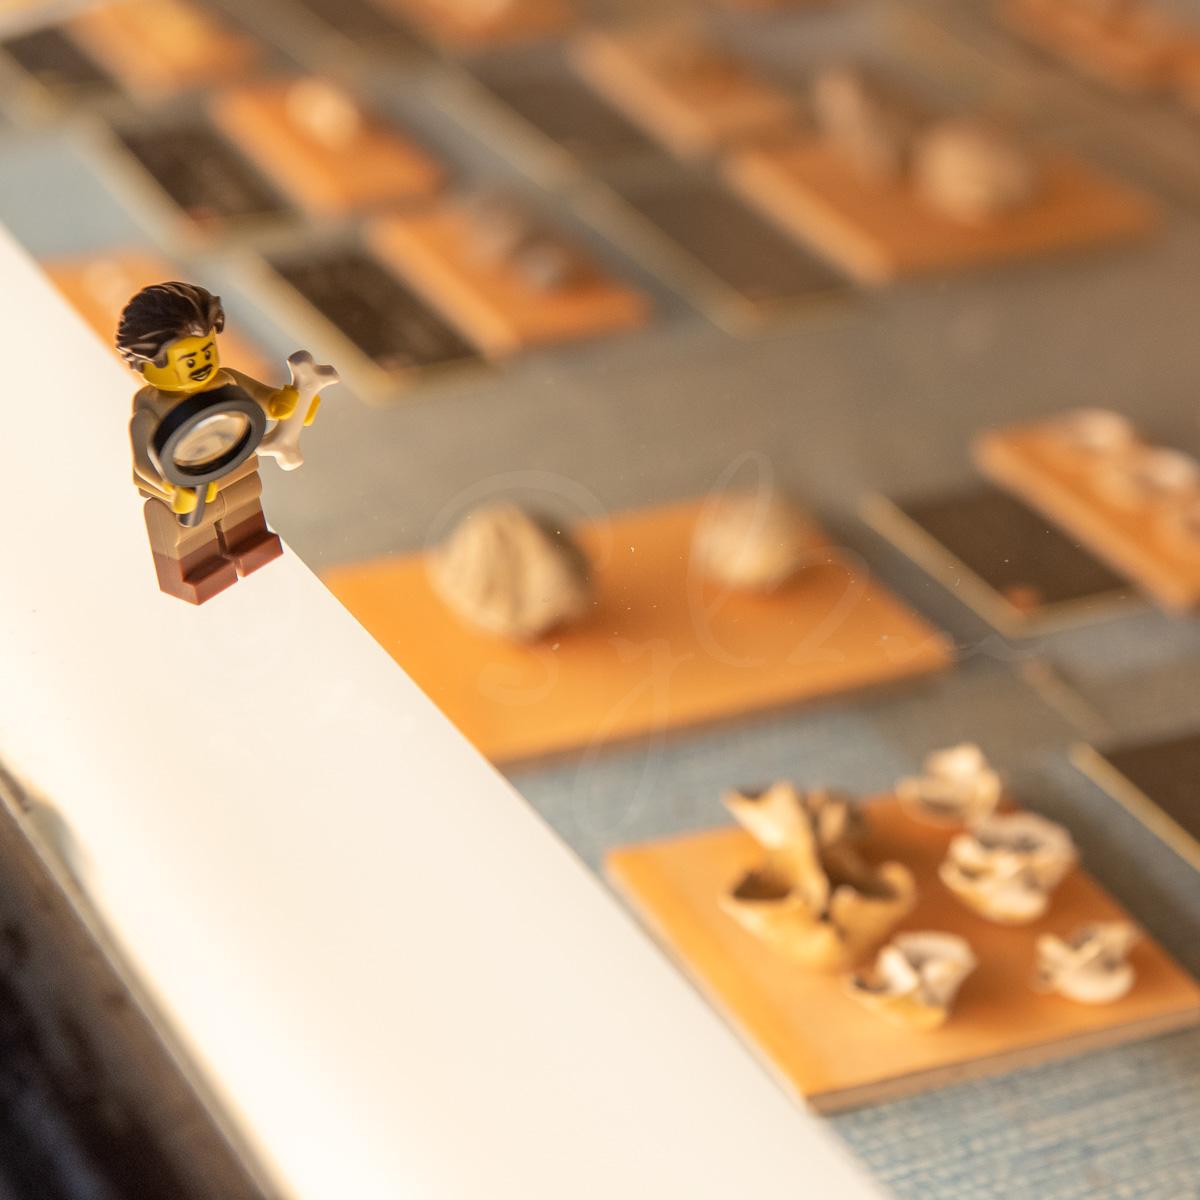 Lego Paléontologue